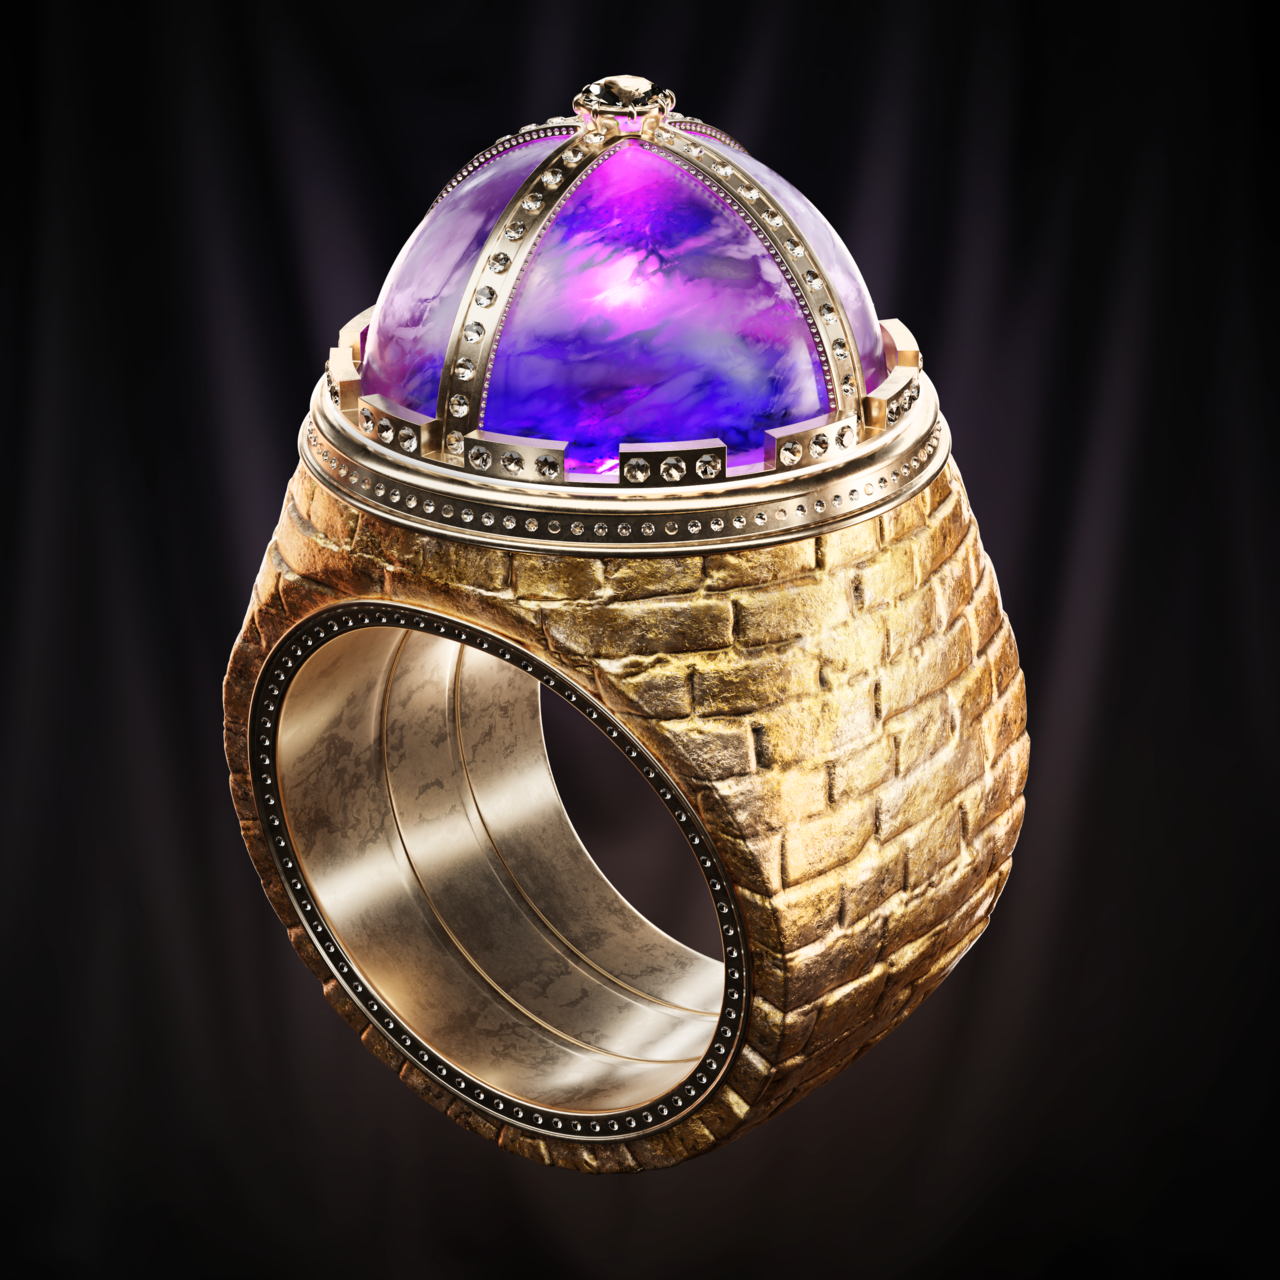 DnD Ring Design